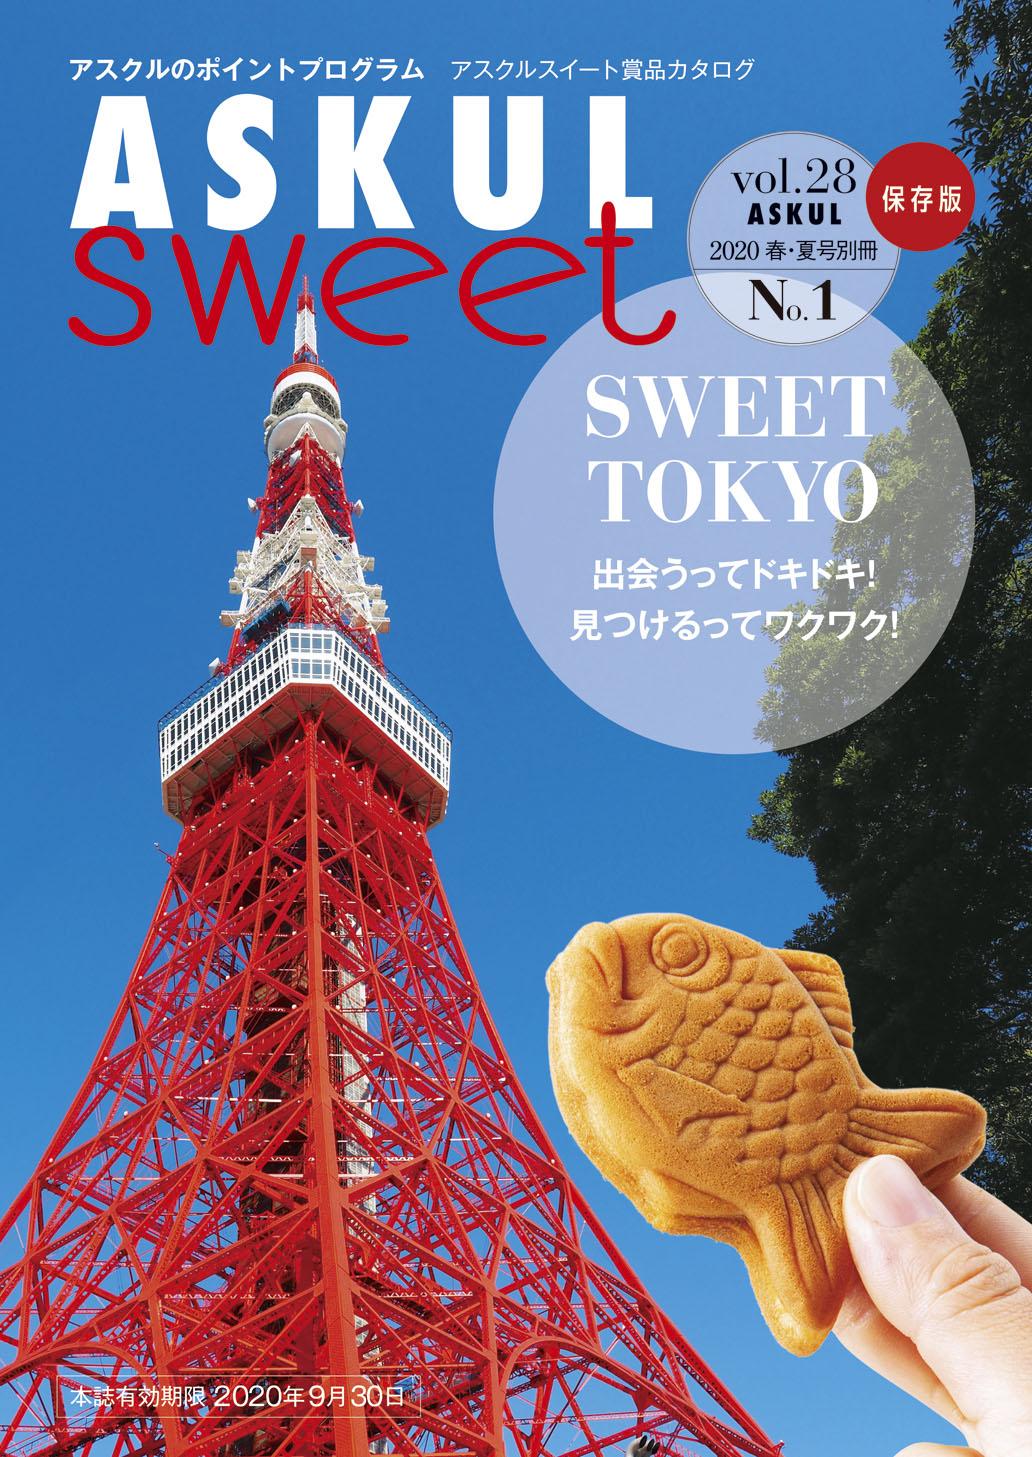 ASKUL sweet